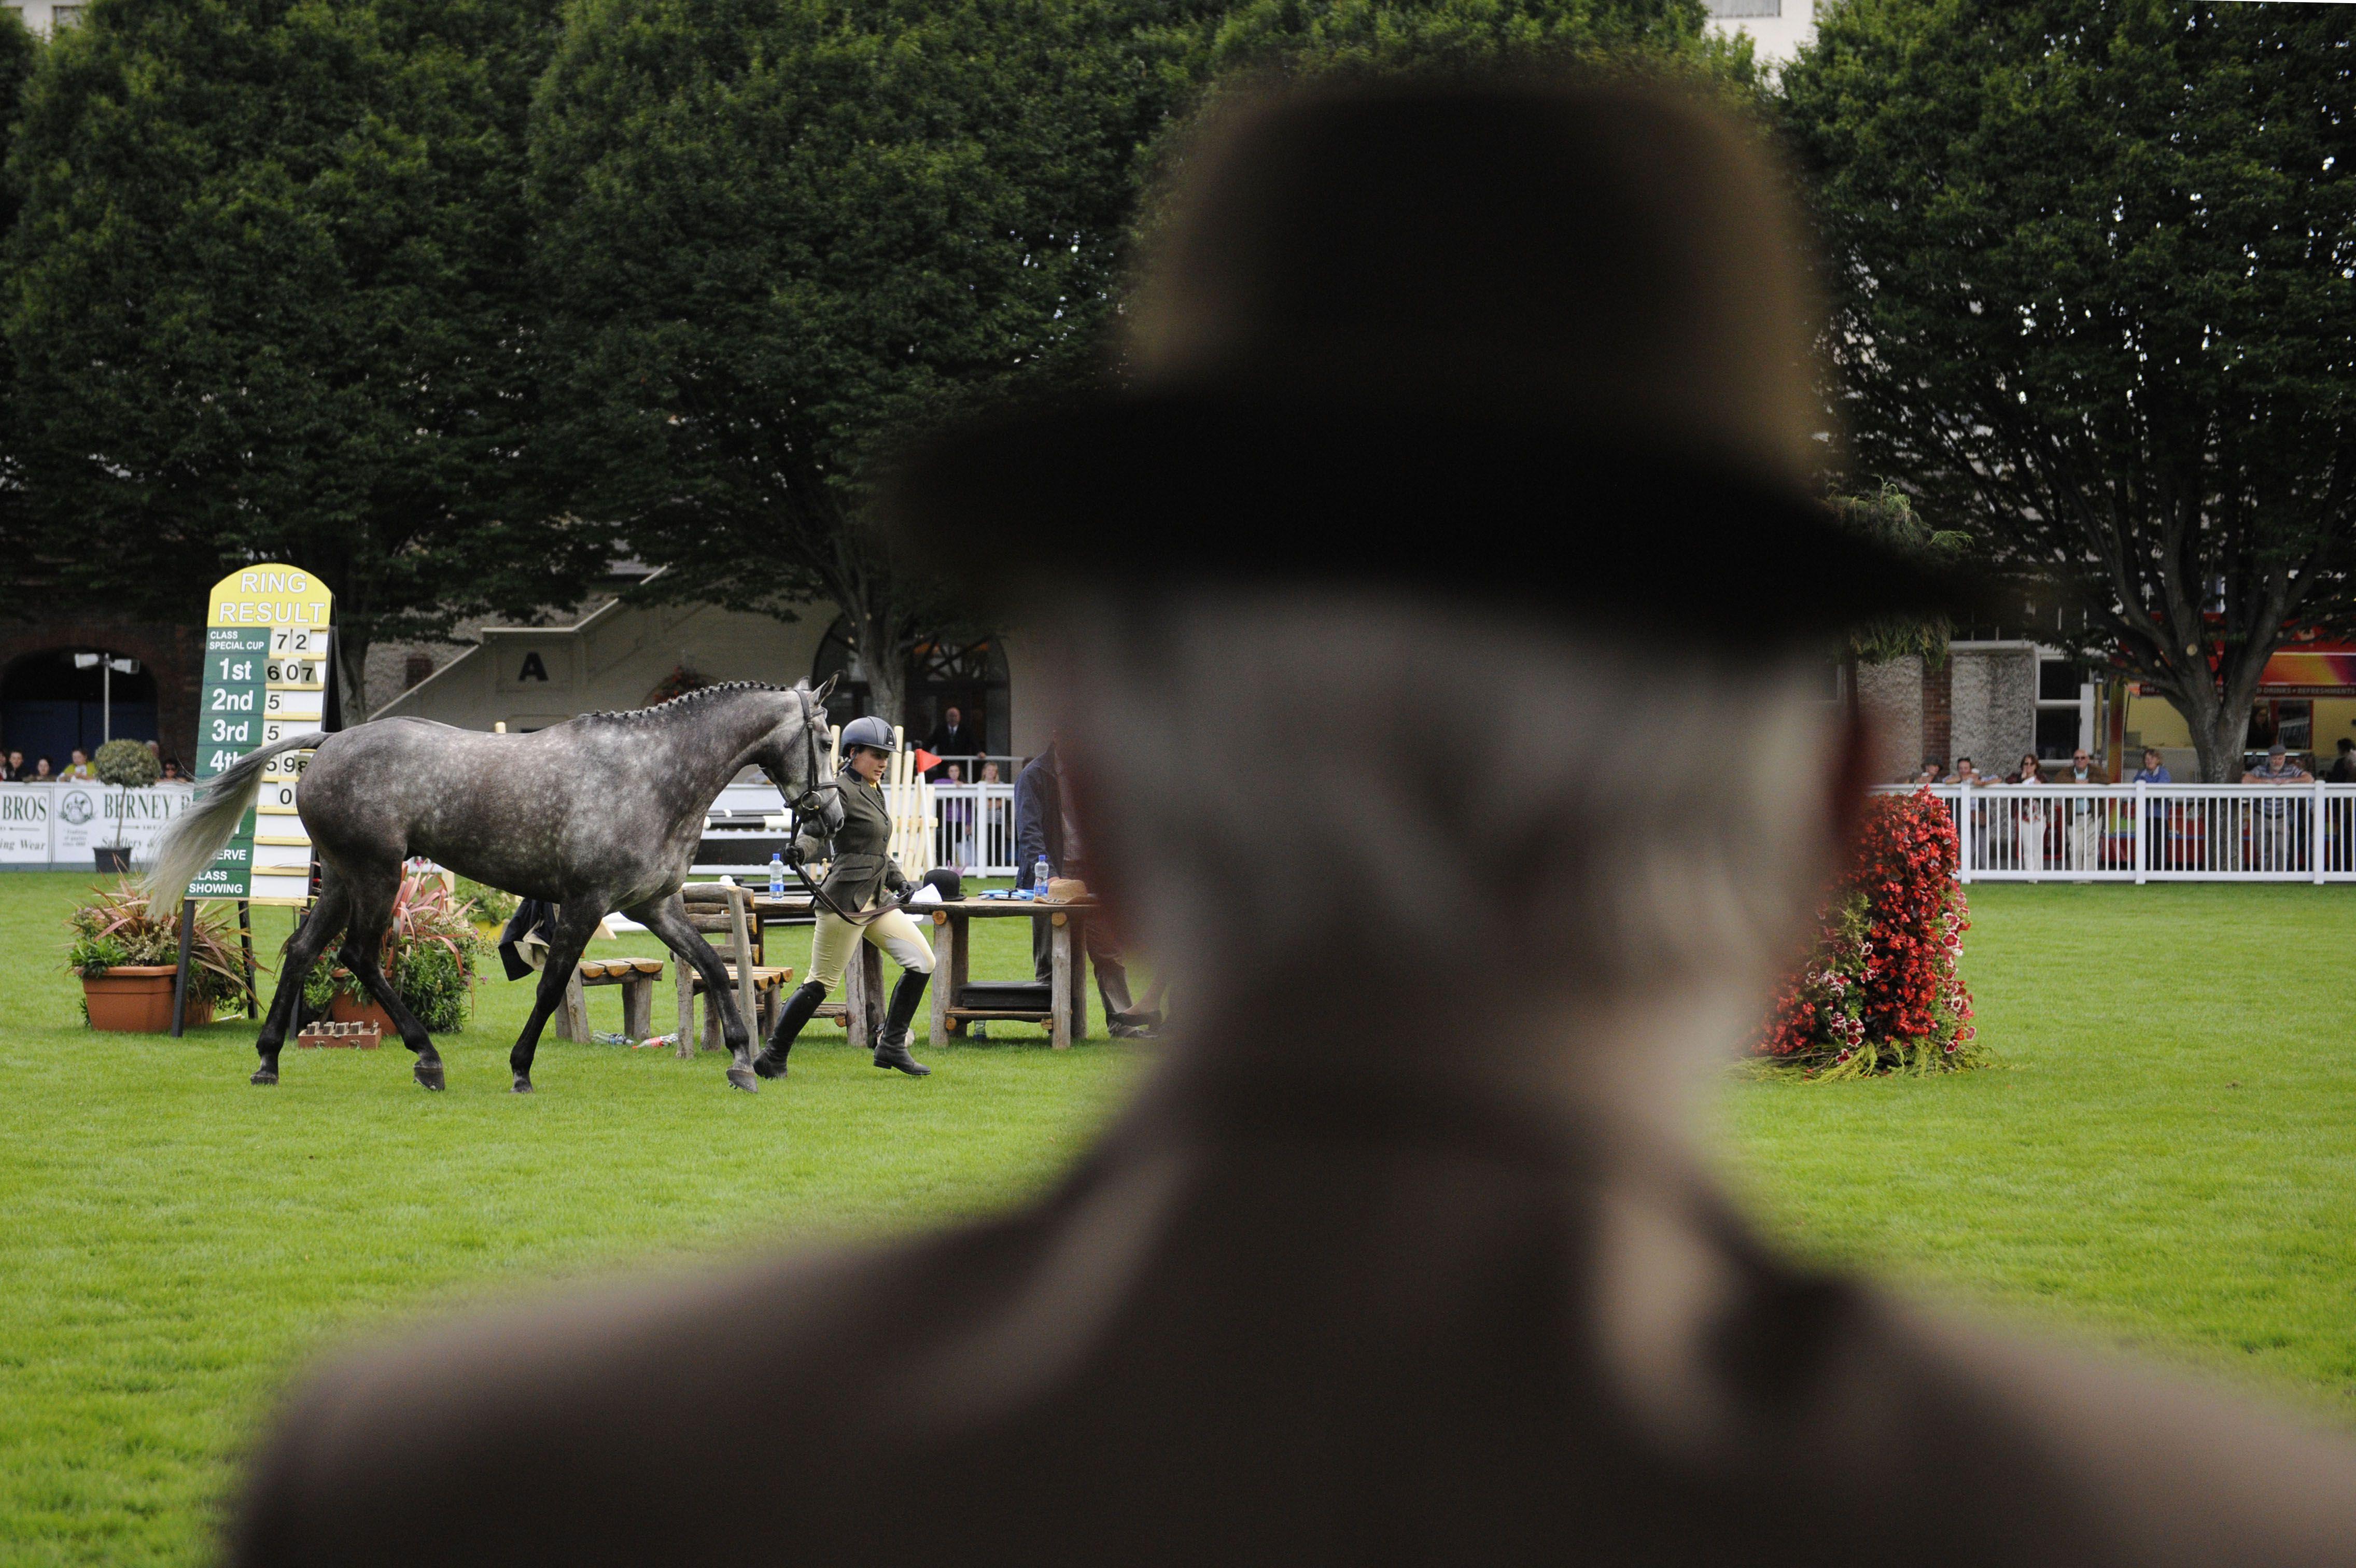 Dublin Horse Show 2014